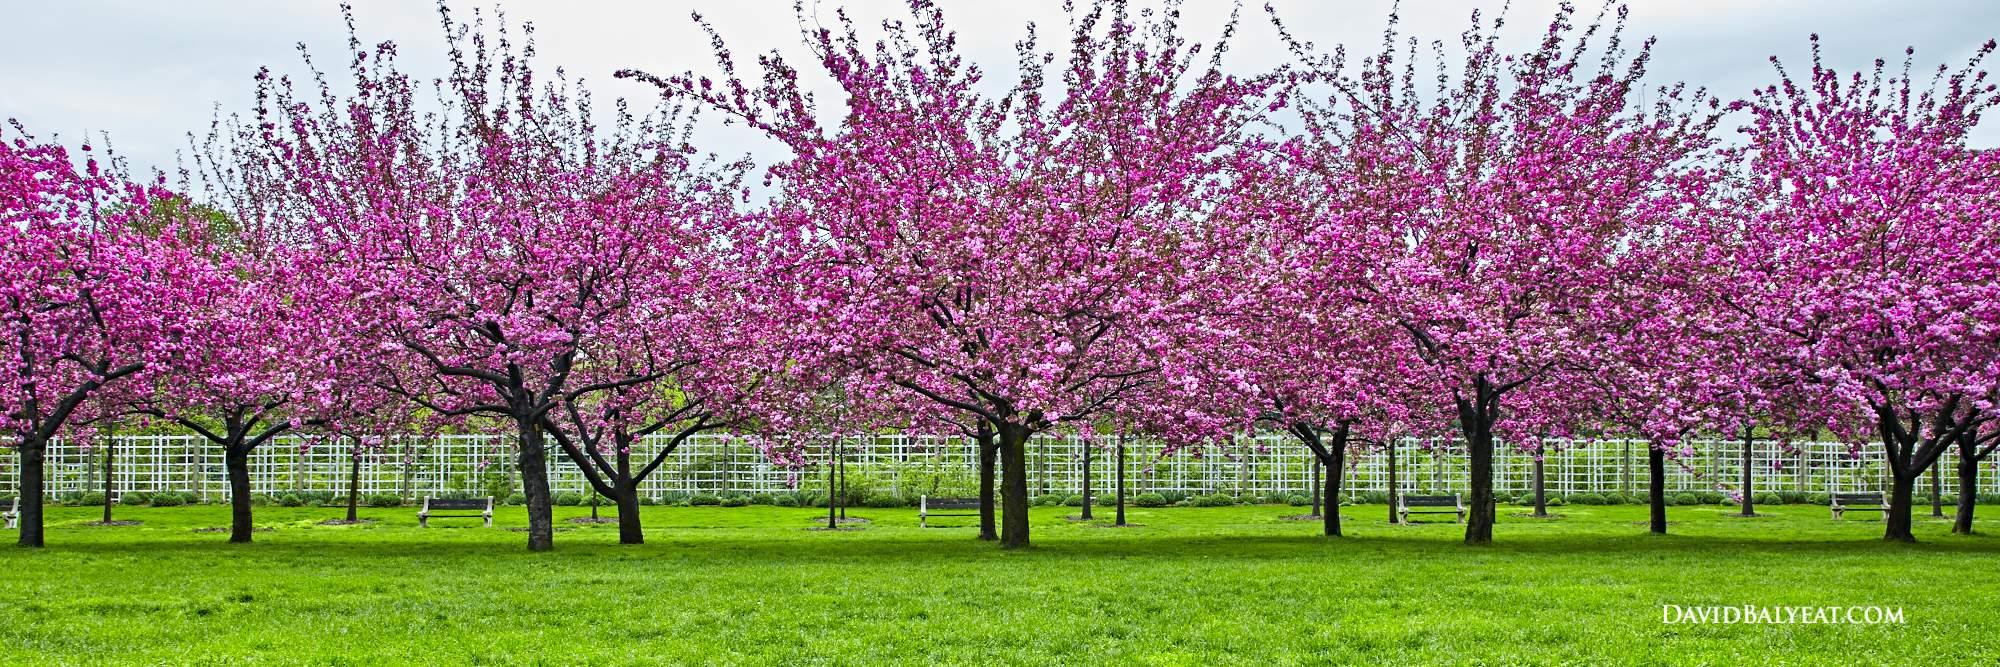 Brooklyn Botanic Garden cherry blossoms New York City high definition HD professional photography